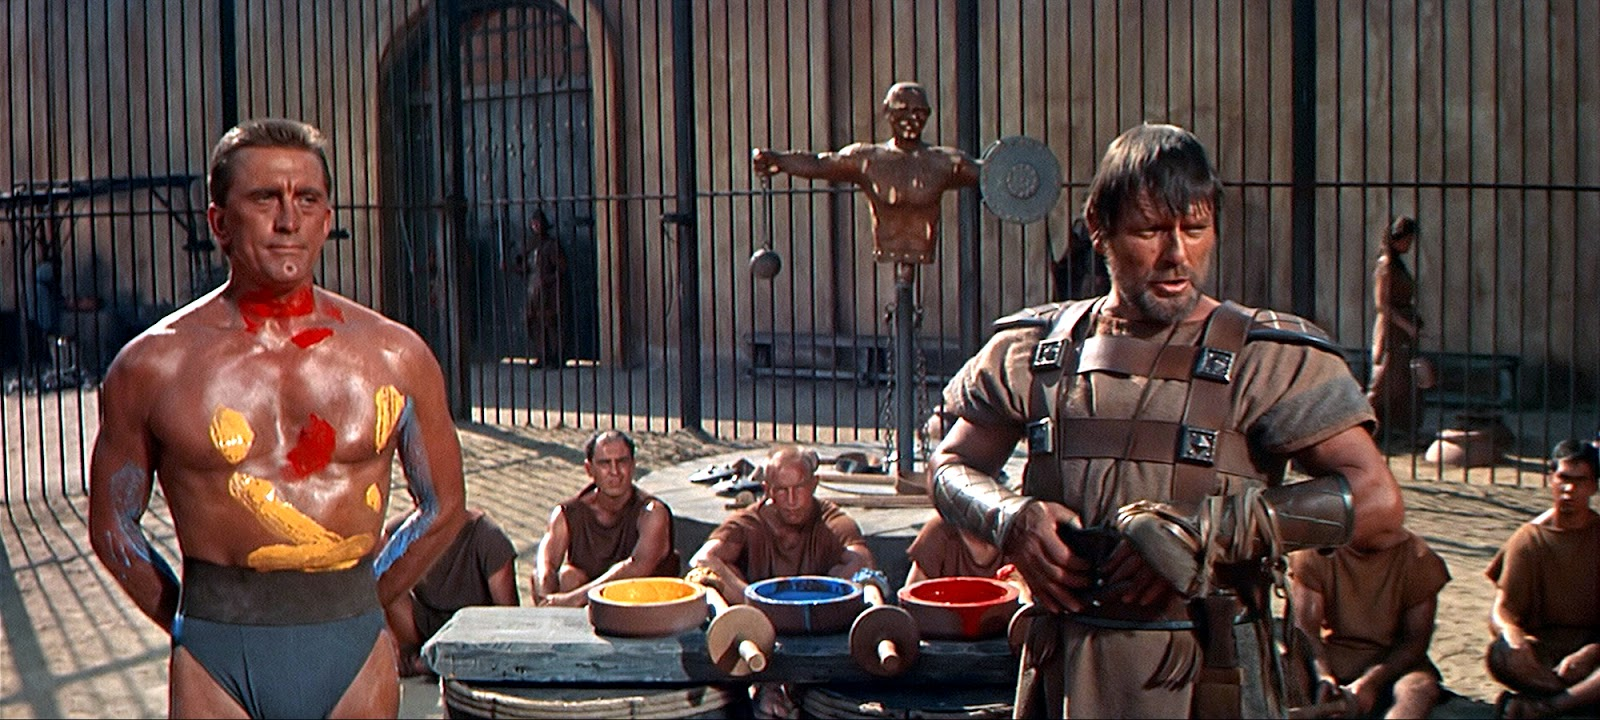 Filme Spartacus within o rato cinéfilo: spartacus (1960)